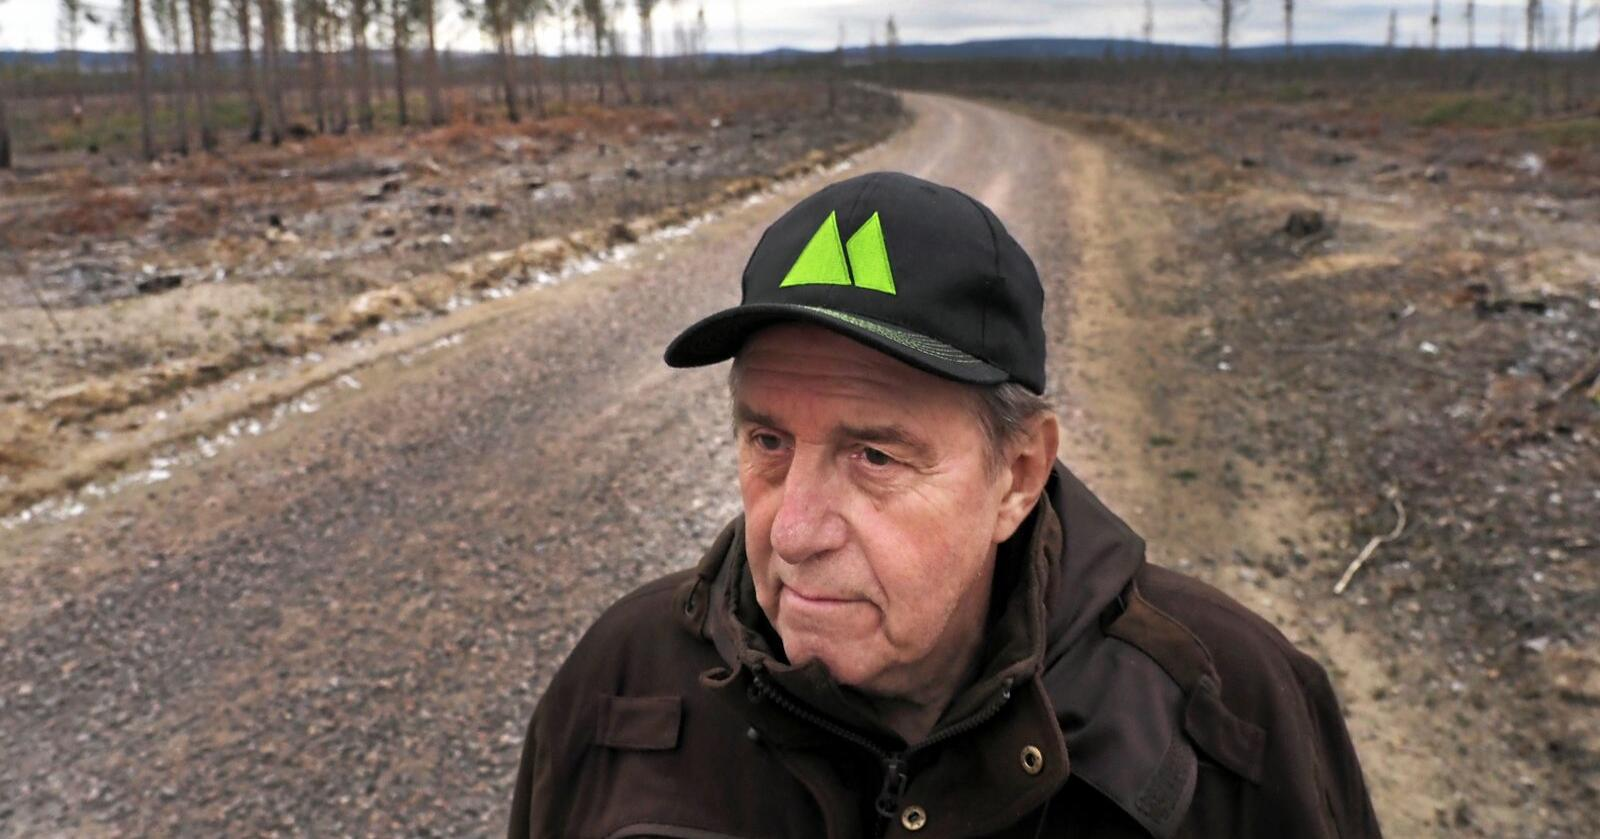 Björn Brink forteller at han mistet skog verdt opptil 13 millioner i fjorårets storbrann. Foto: Siri Juell Rasmussen